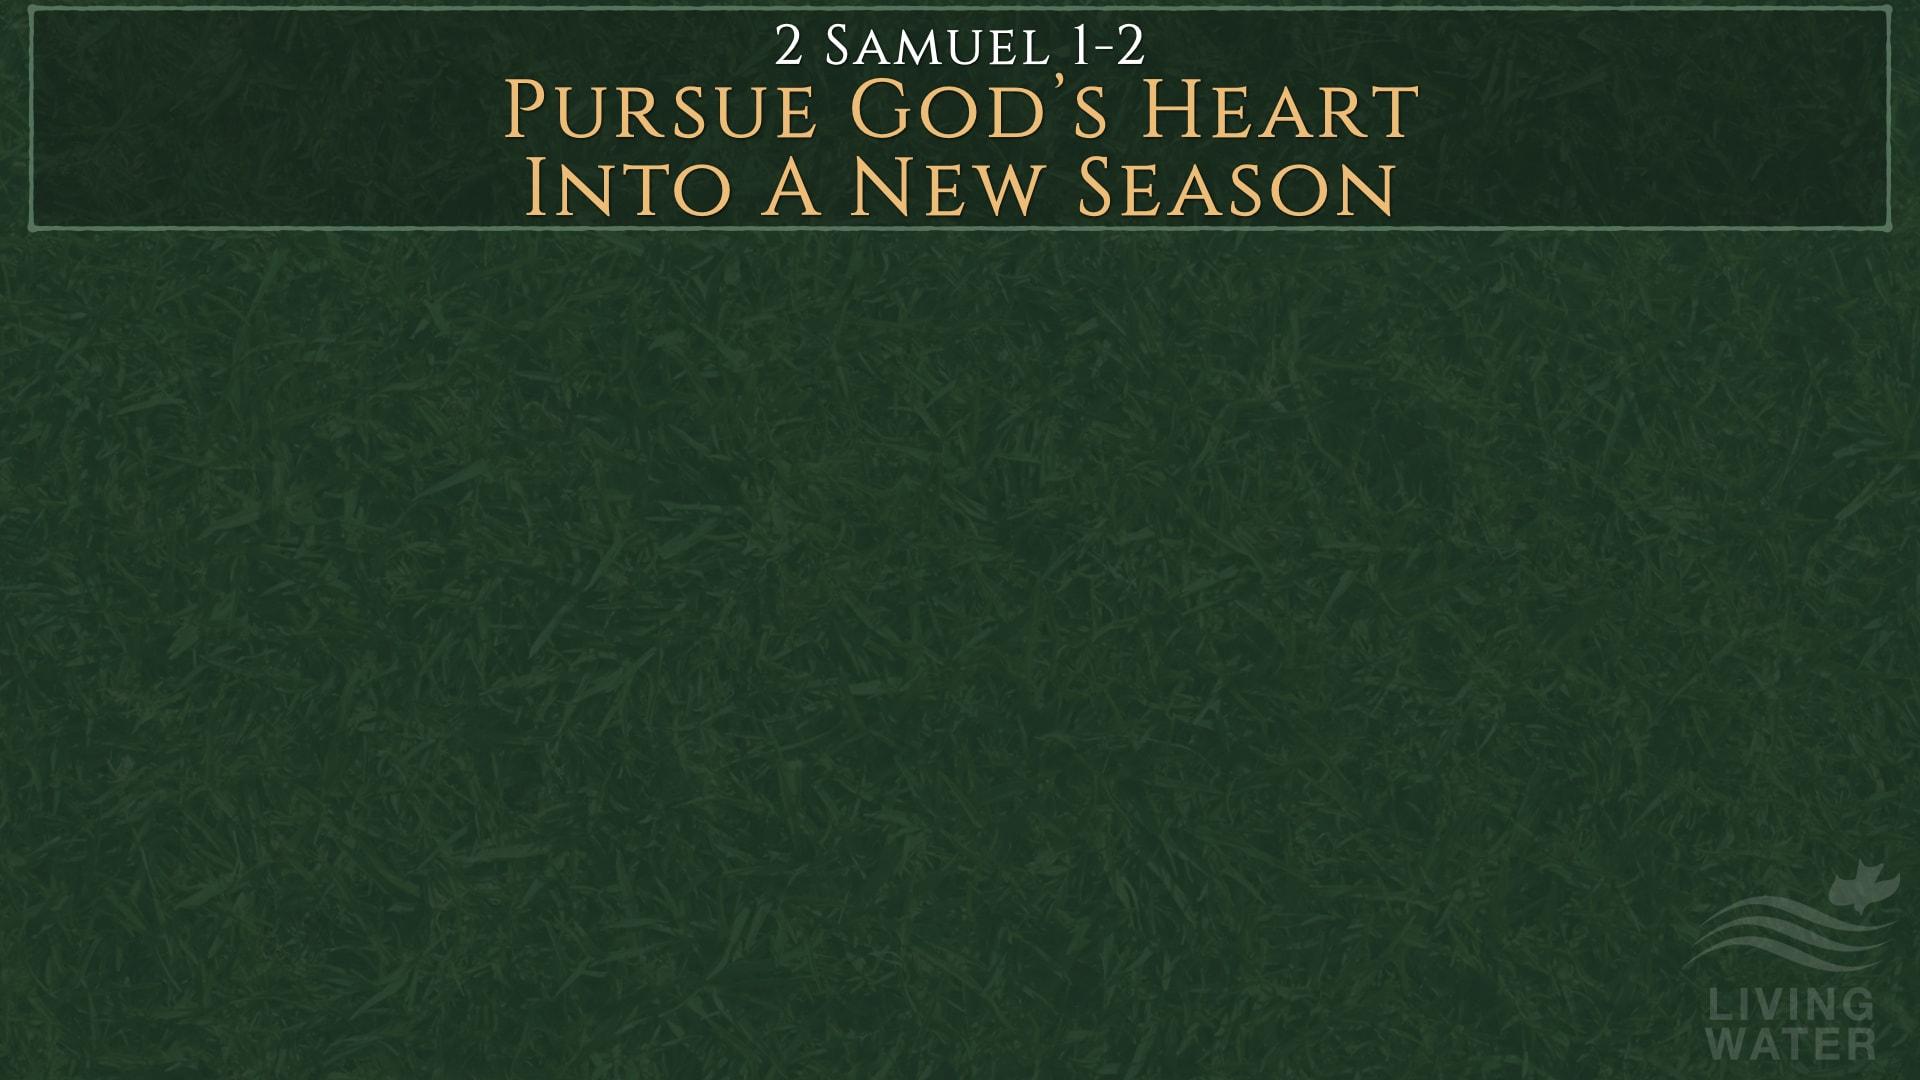 2 Samuel 1-2, Pursue God's Heart Into A New Season